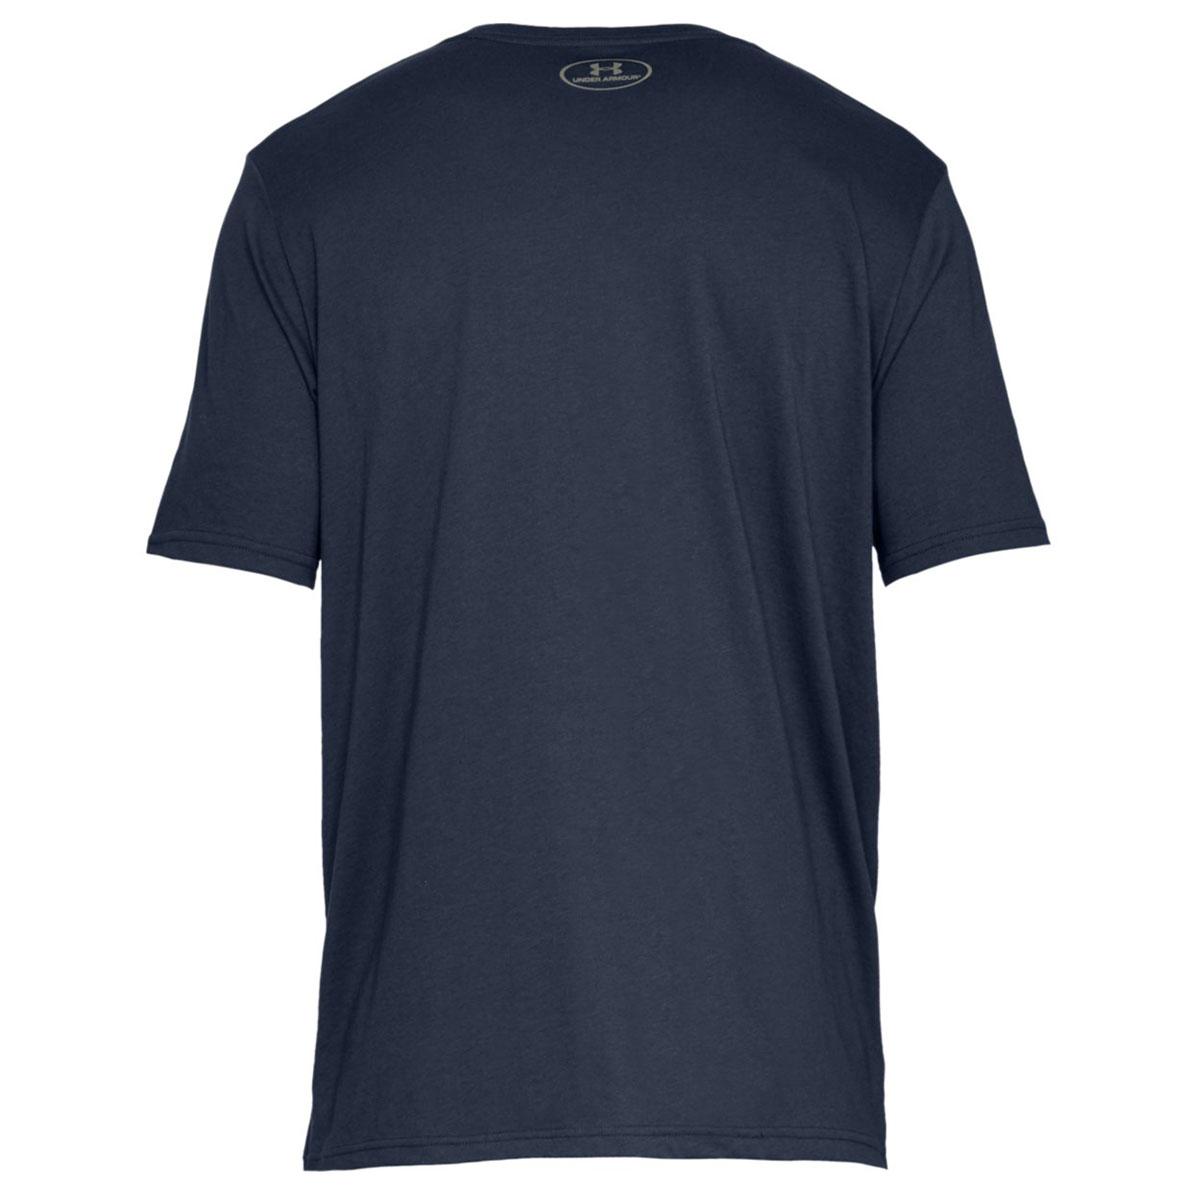 Under-Armour-Mens-2019-UA-Boxed-Sportstyle-HeatGear-Training-Gym-T-Shirt-Tee thumbnail 5